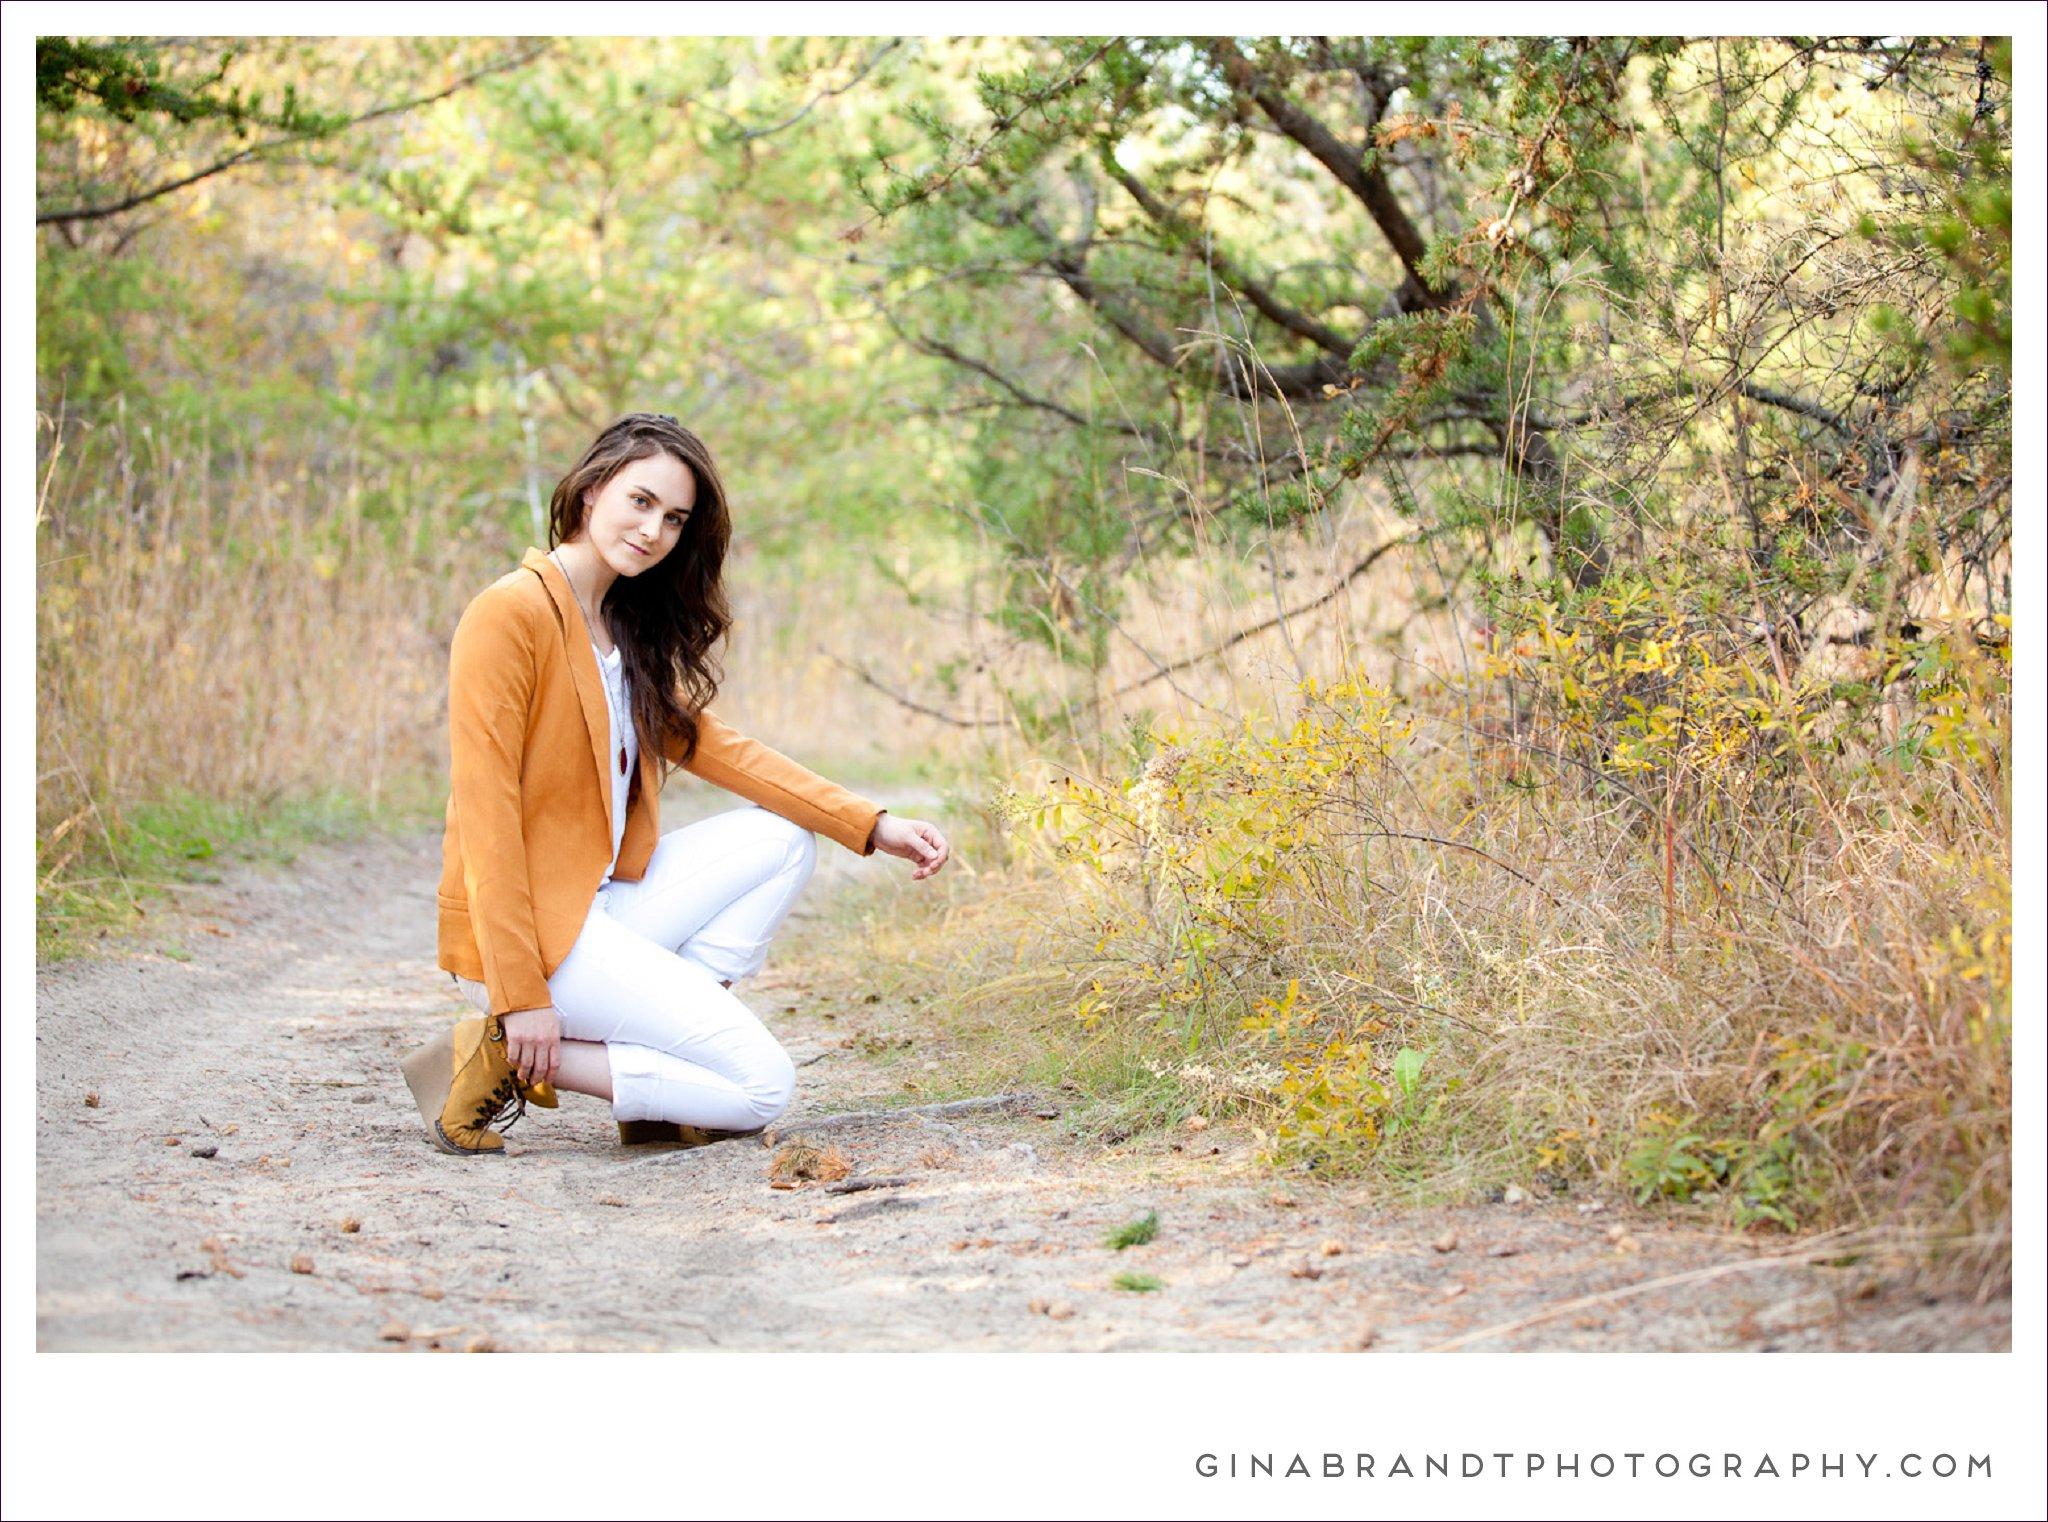 Gina Brandt Photography_0005.jpg